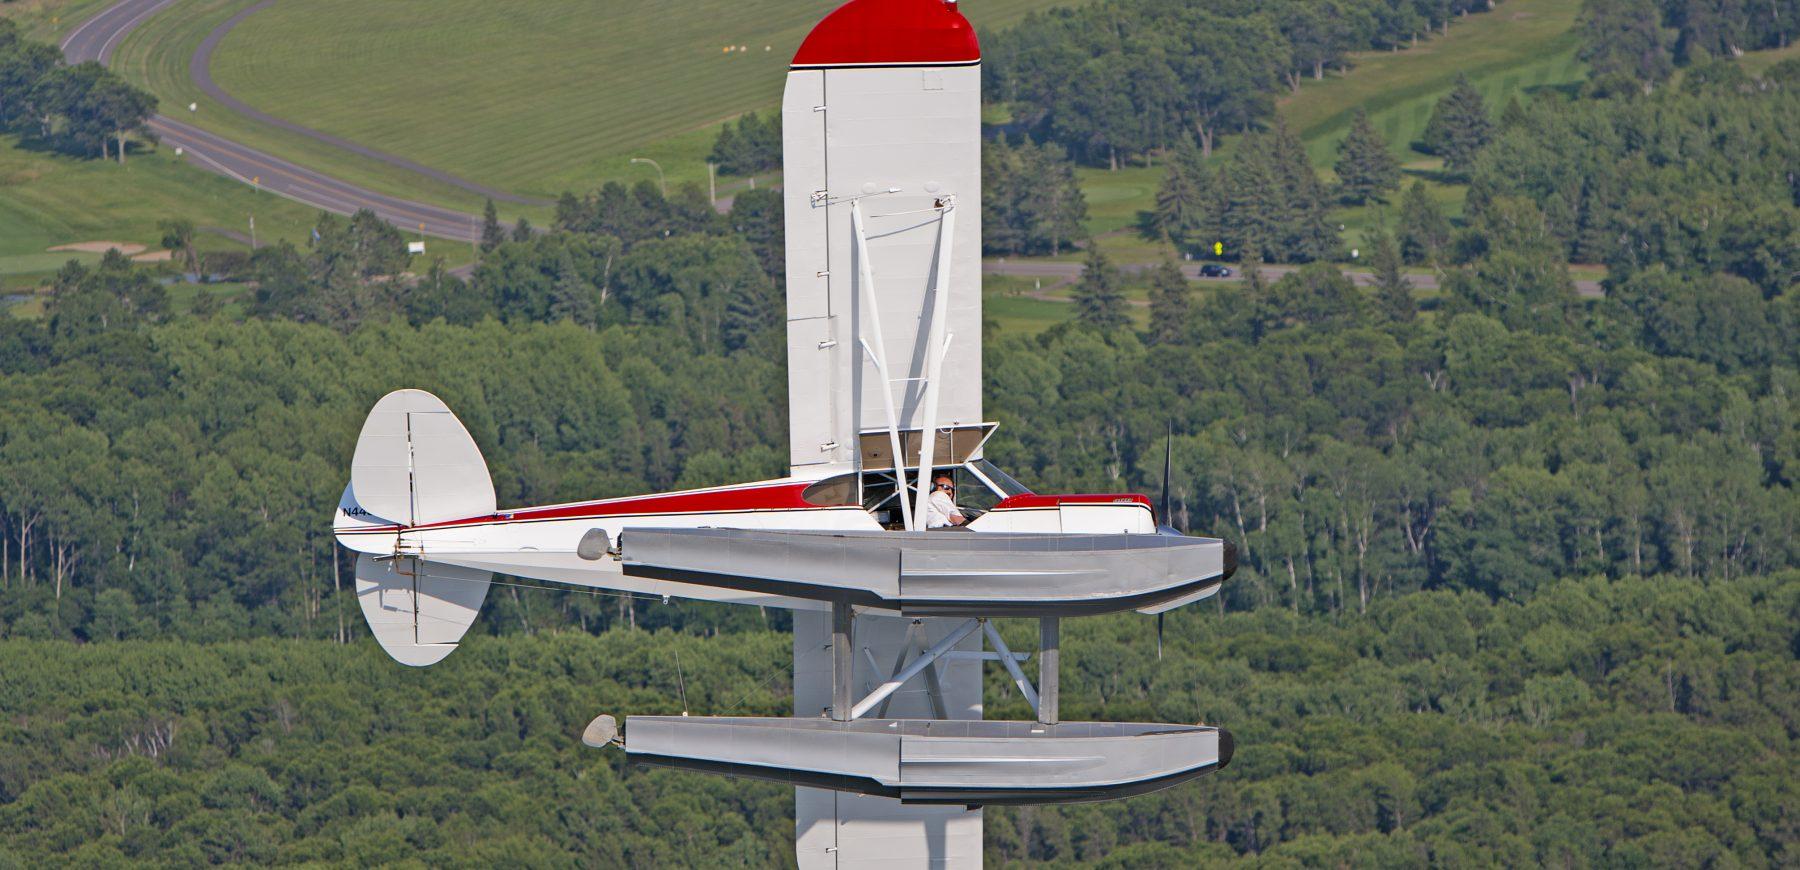 Super Cub Seaplane in Flight